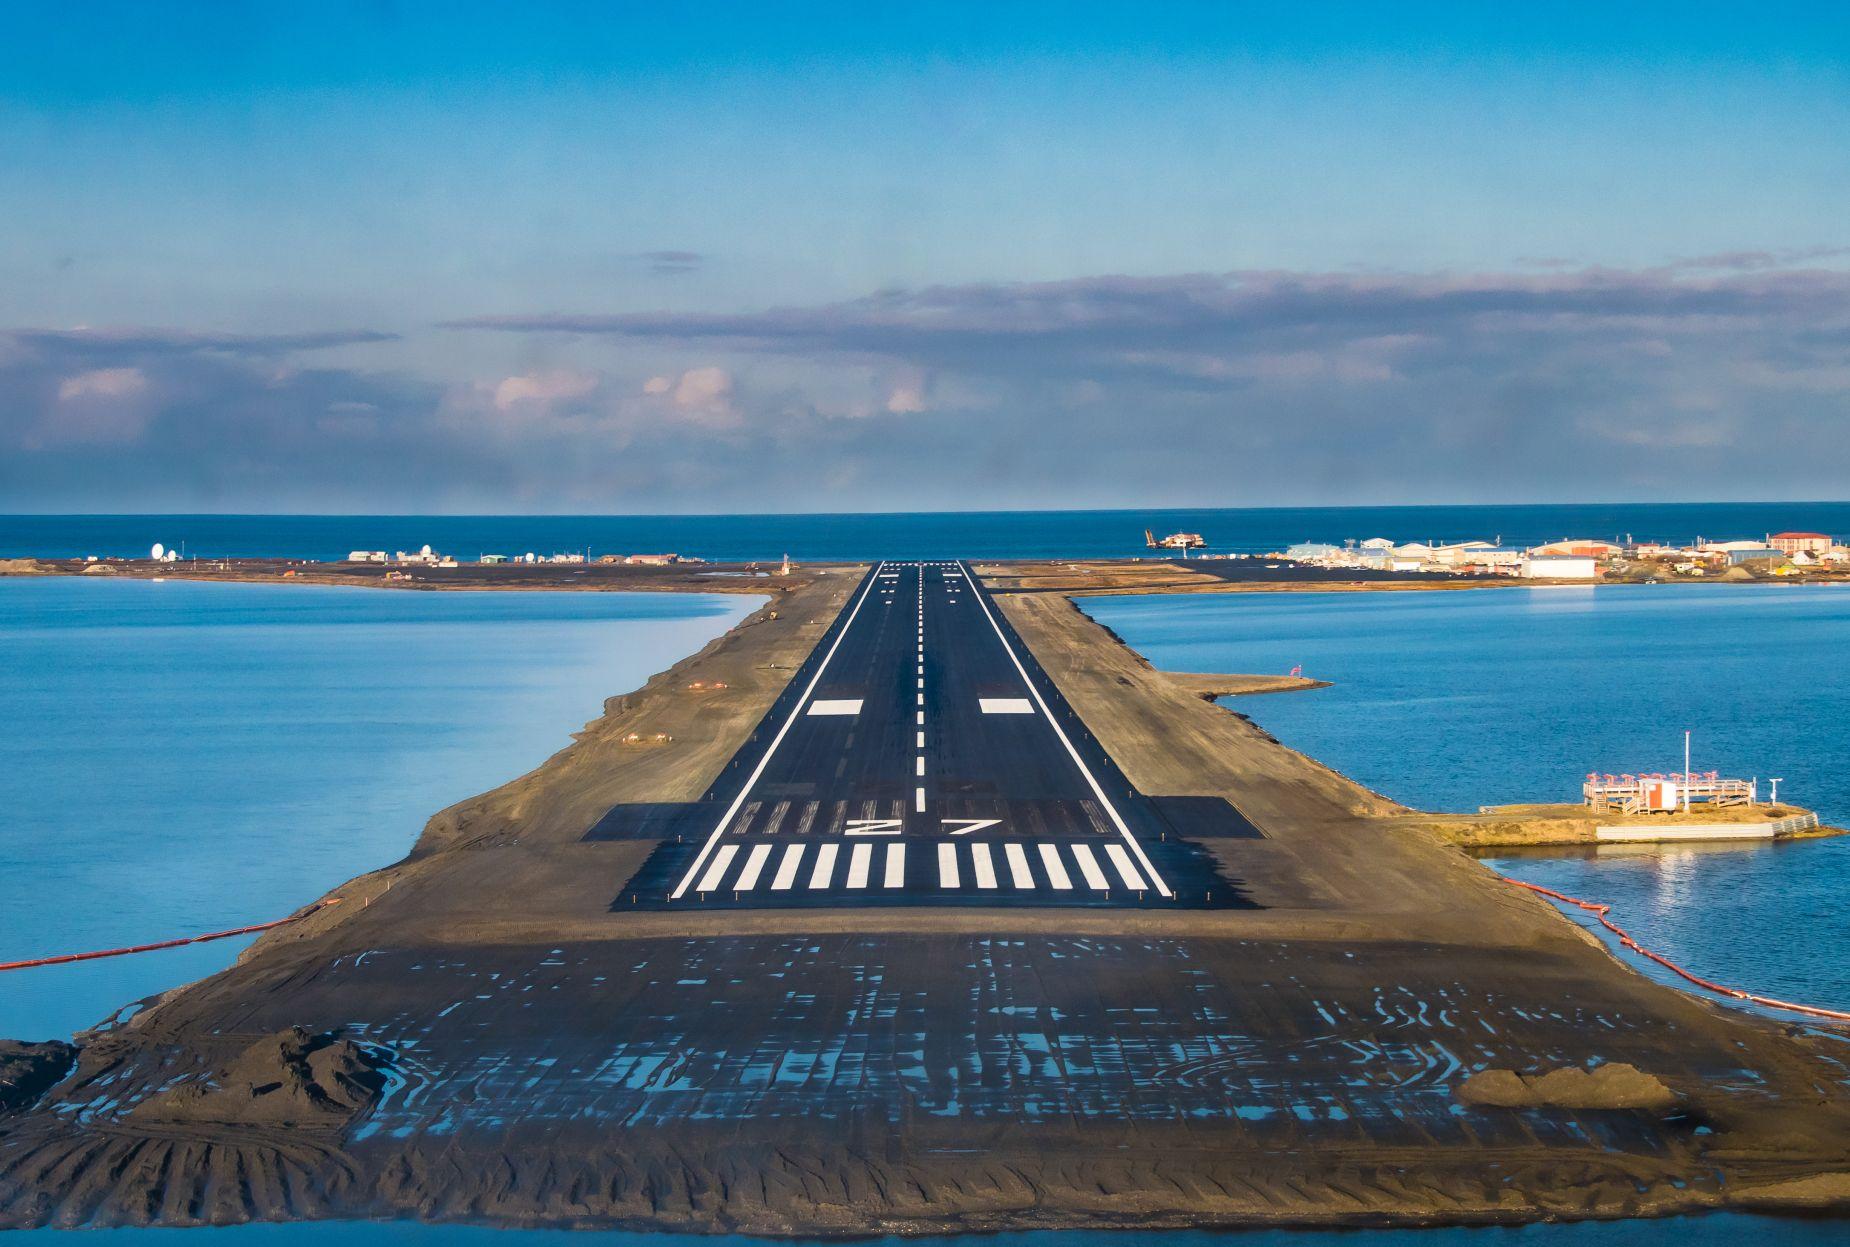 Lotnisko w Arktyce